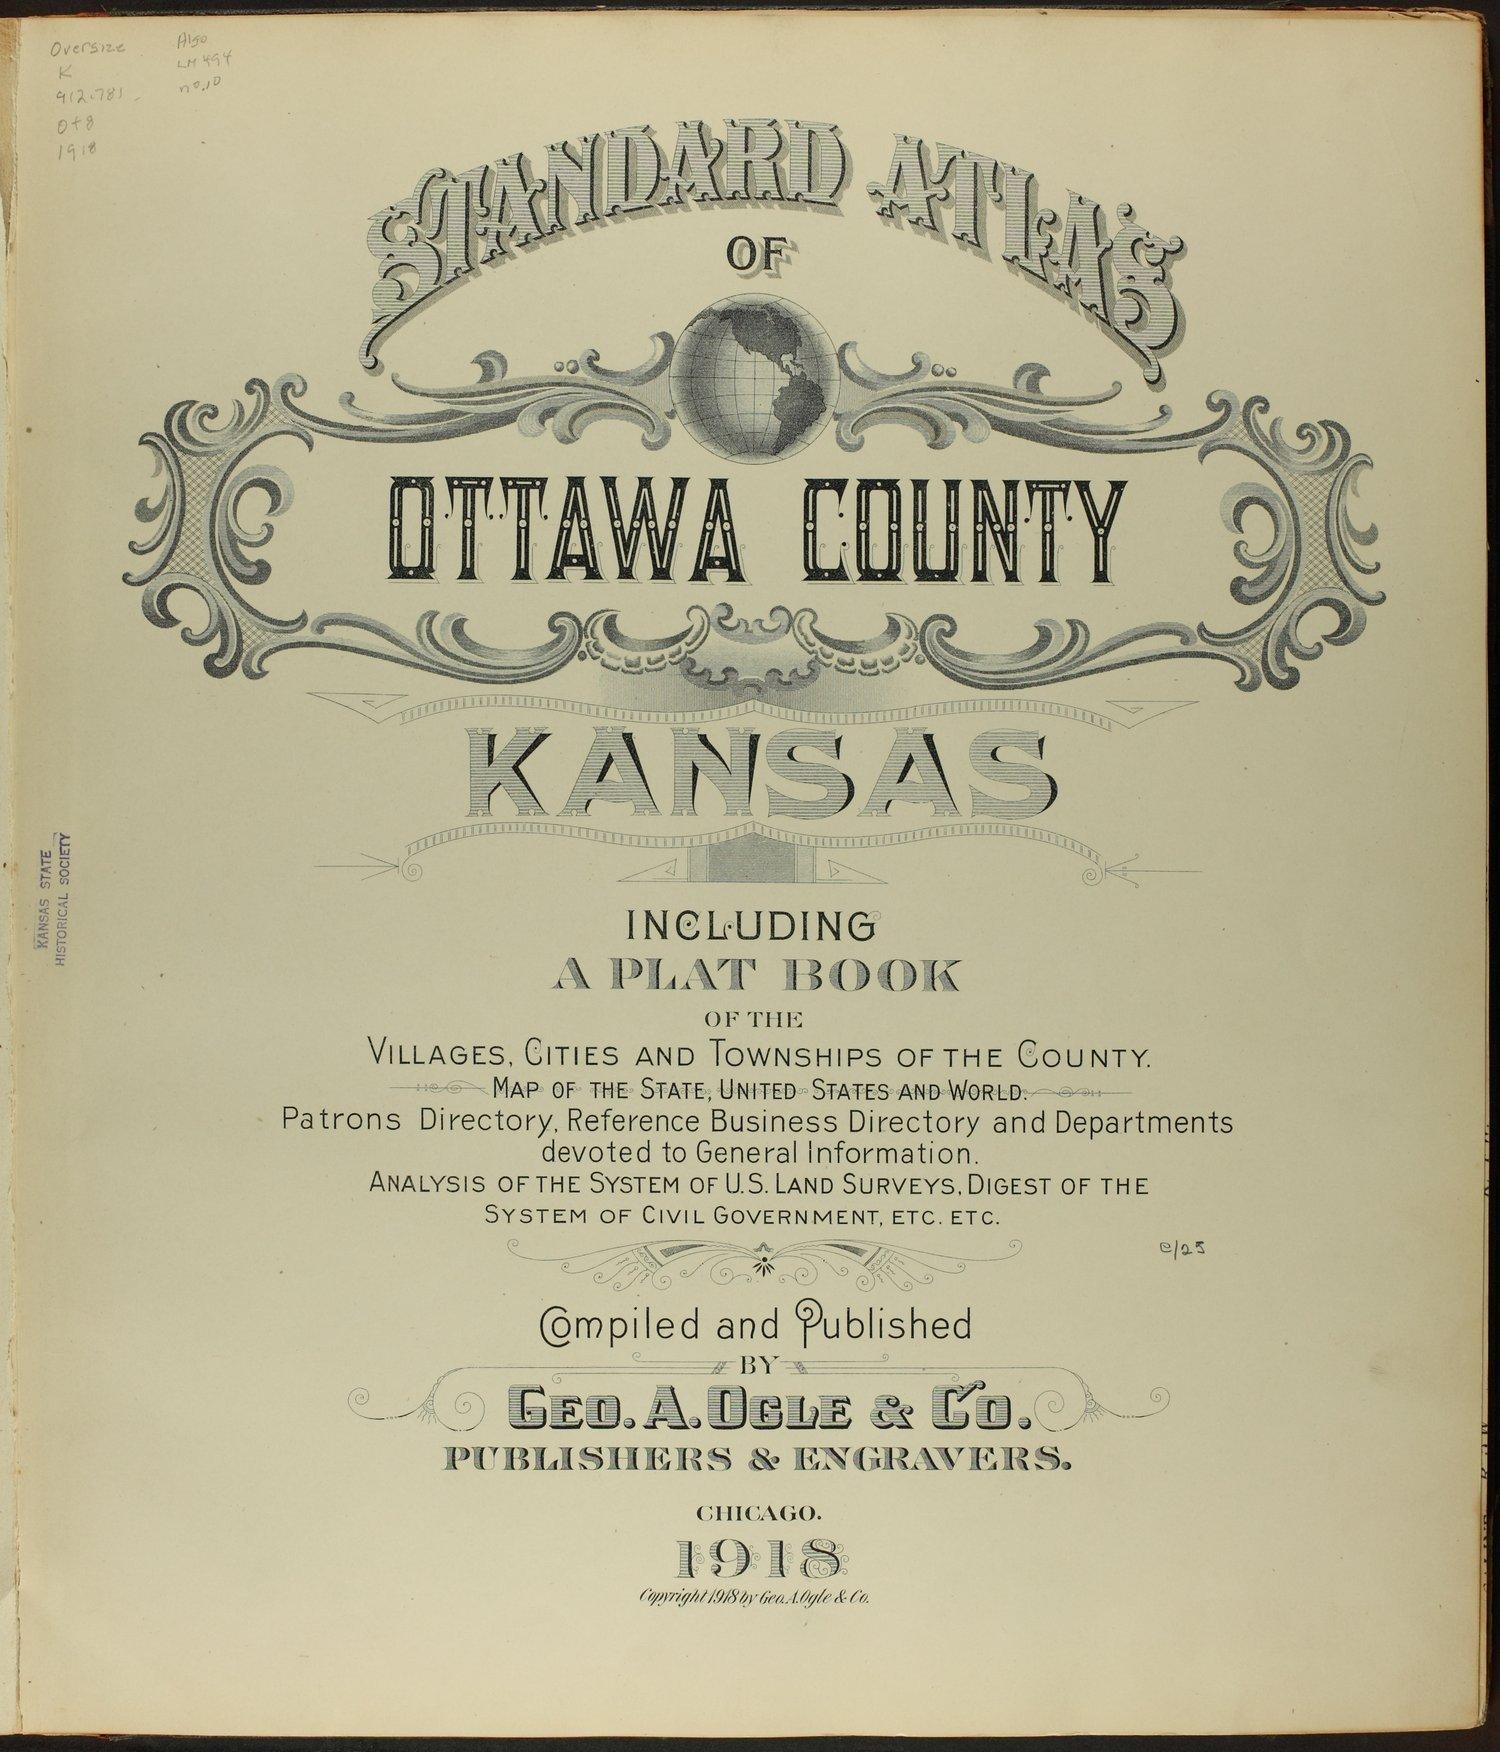 Standard atlas of Ottawa County, Kansas - Title page